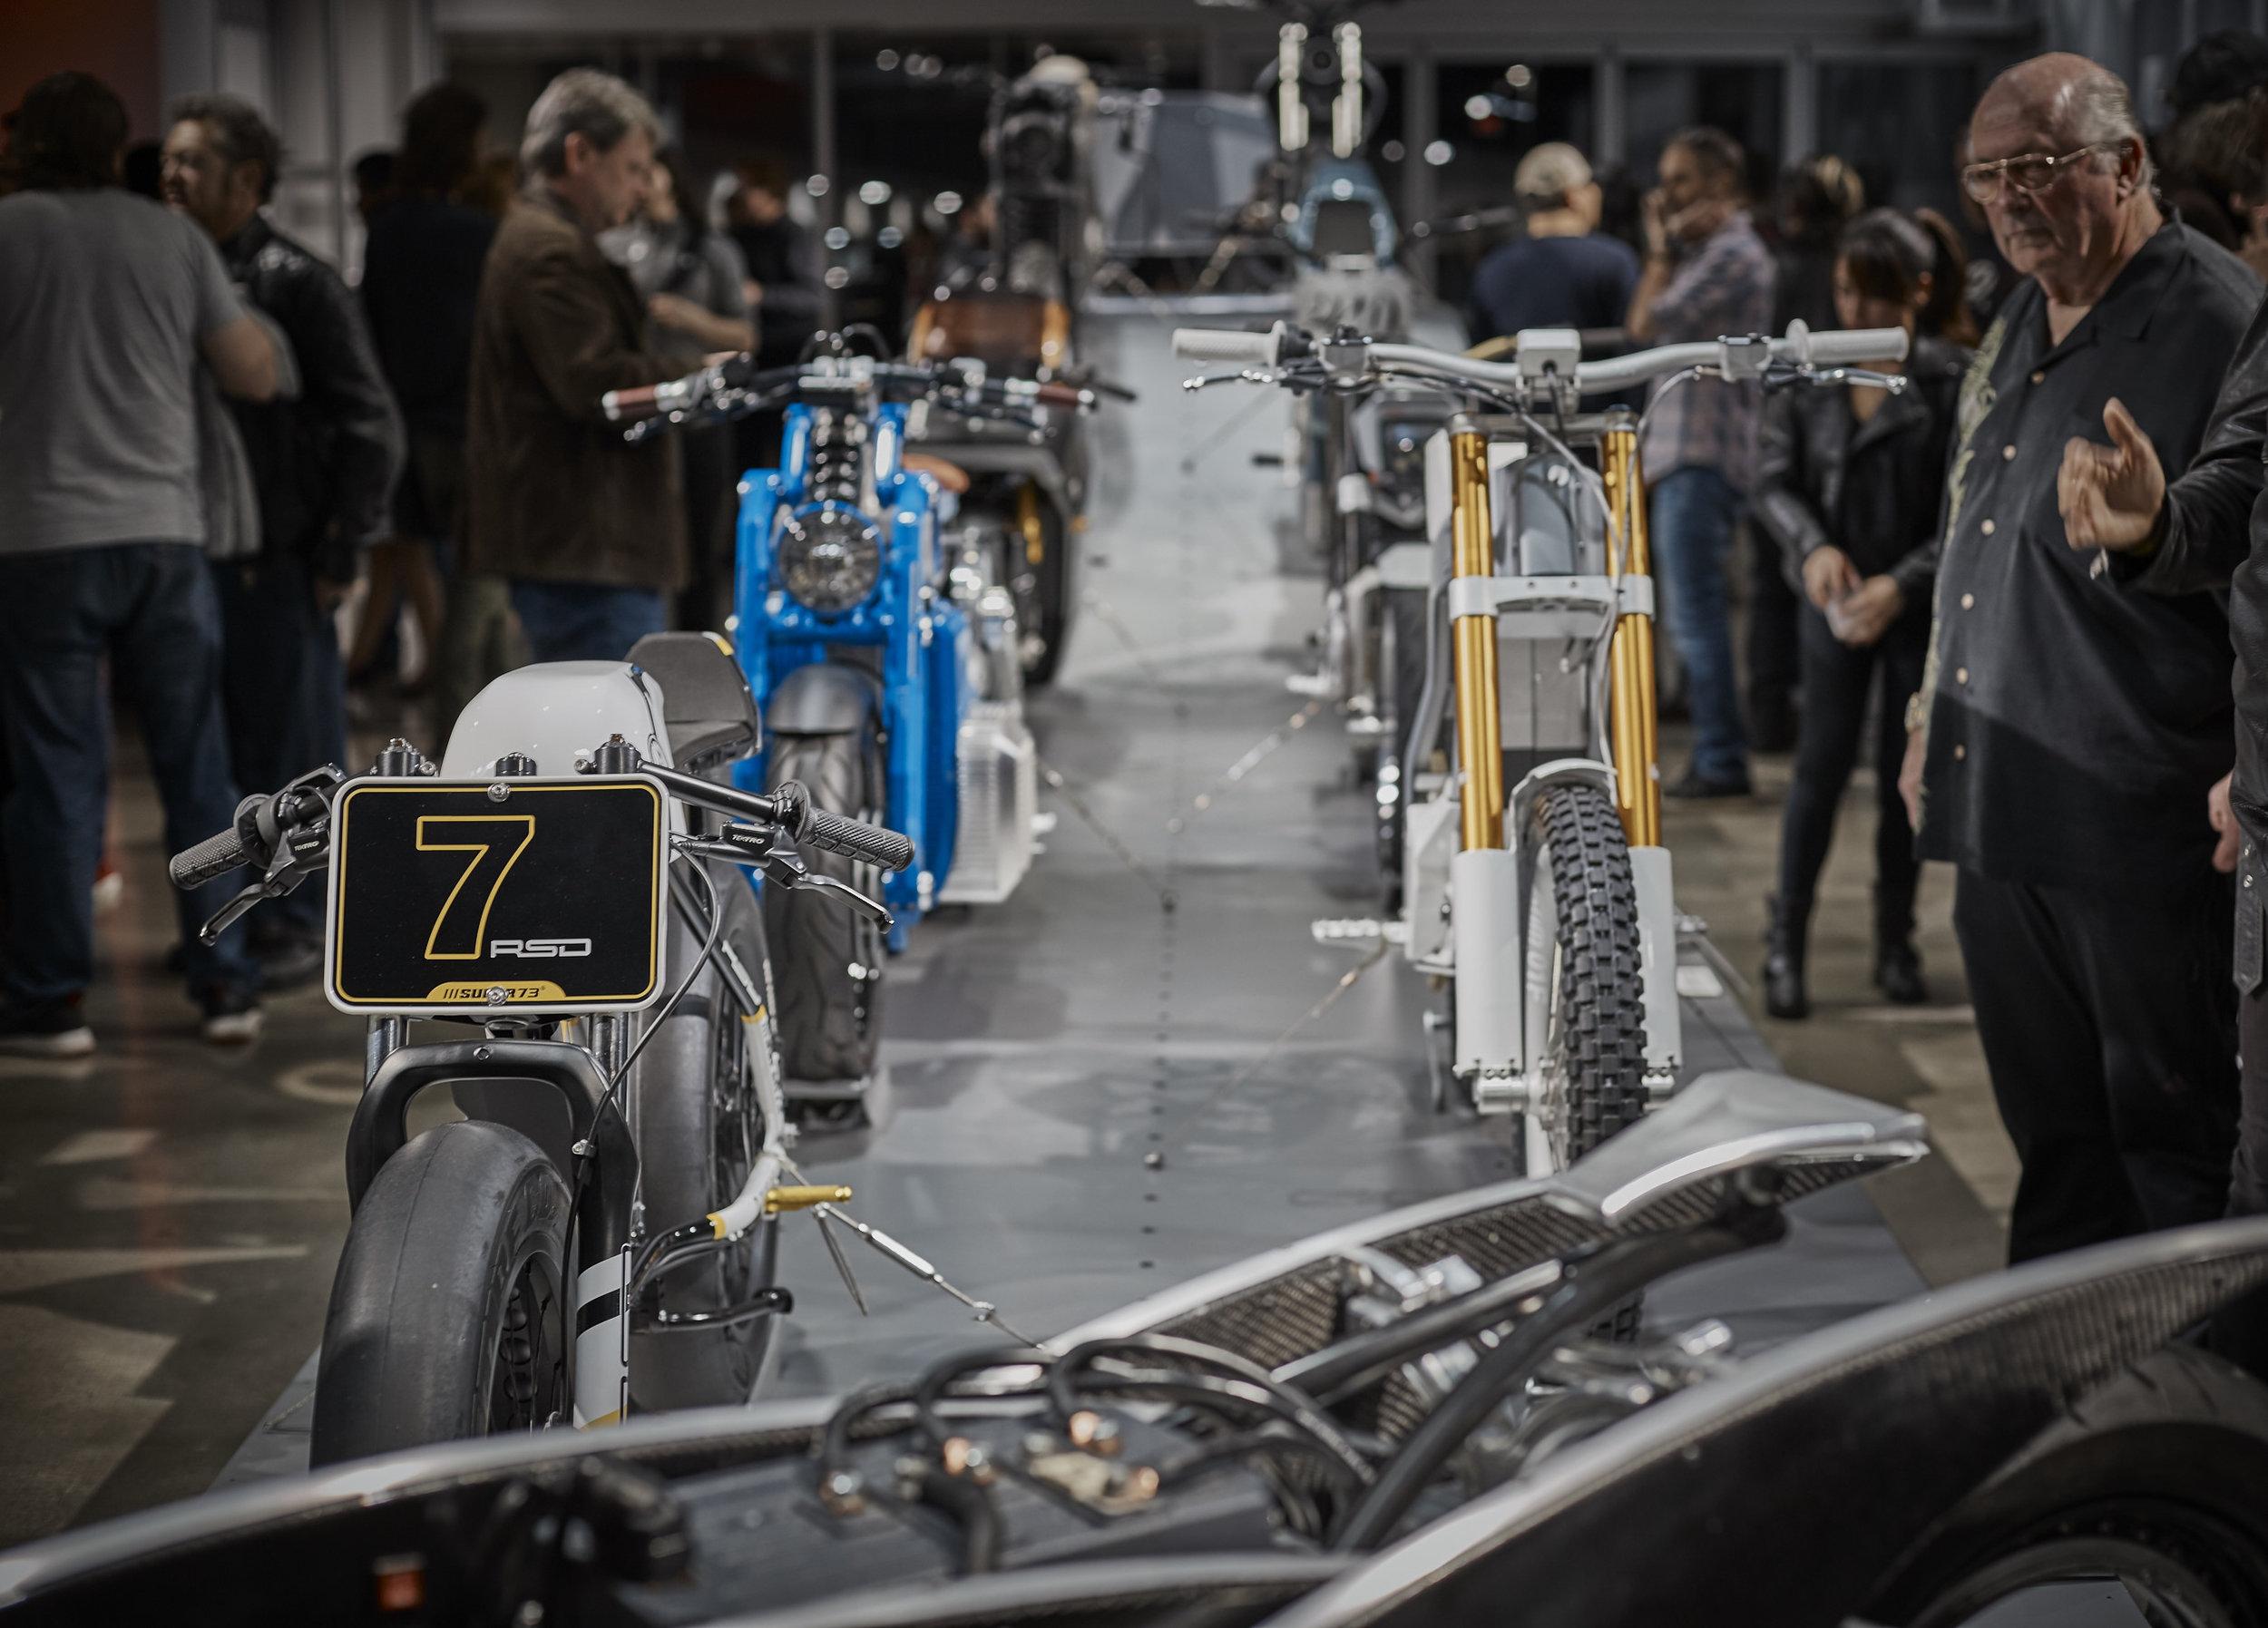 Petersen electric bikes 10.jpg